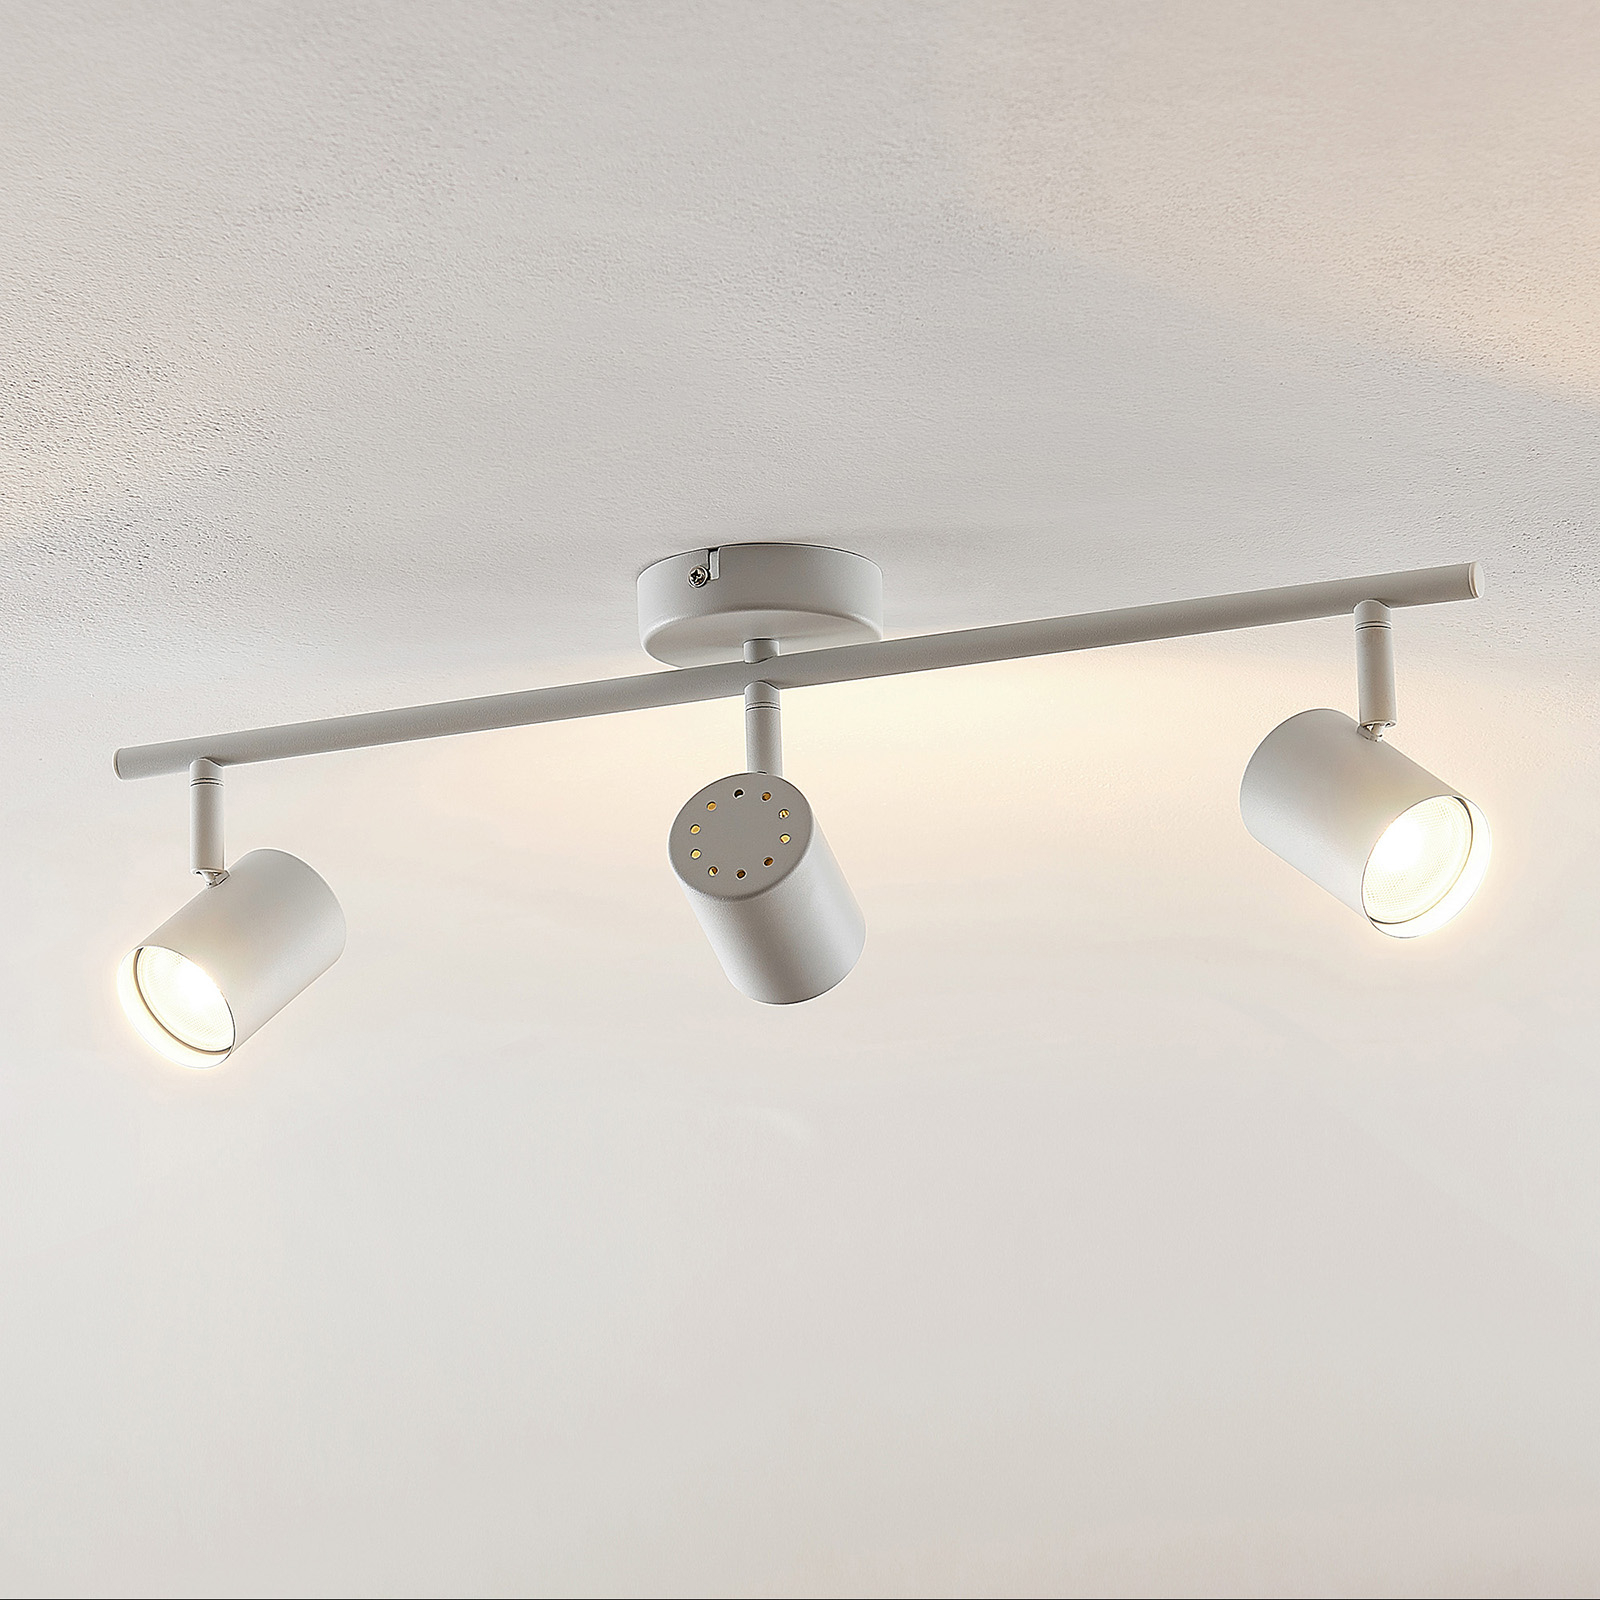 ELC Tomoki lampa sufitowa LED, biała, 3-punktowa